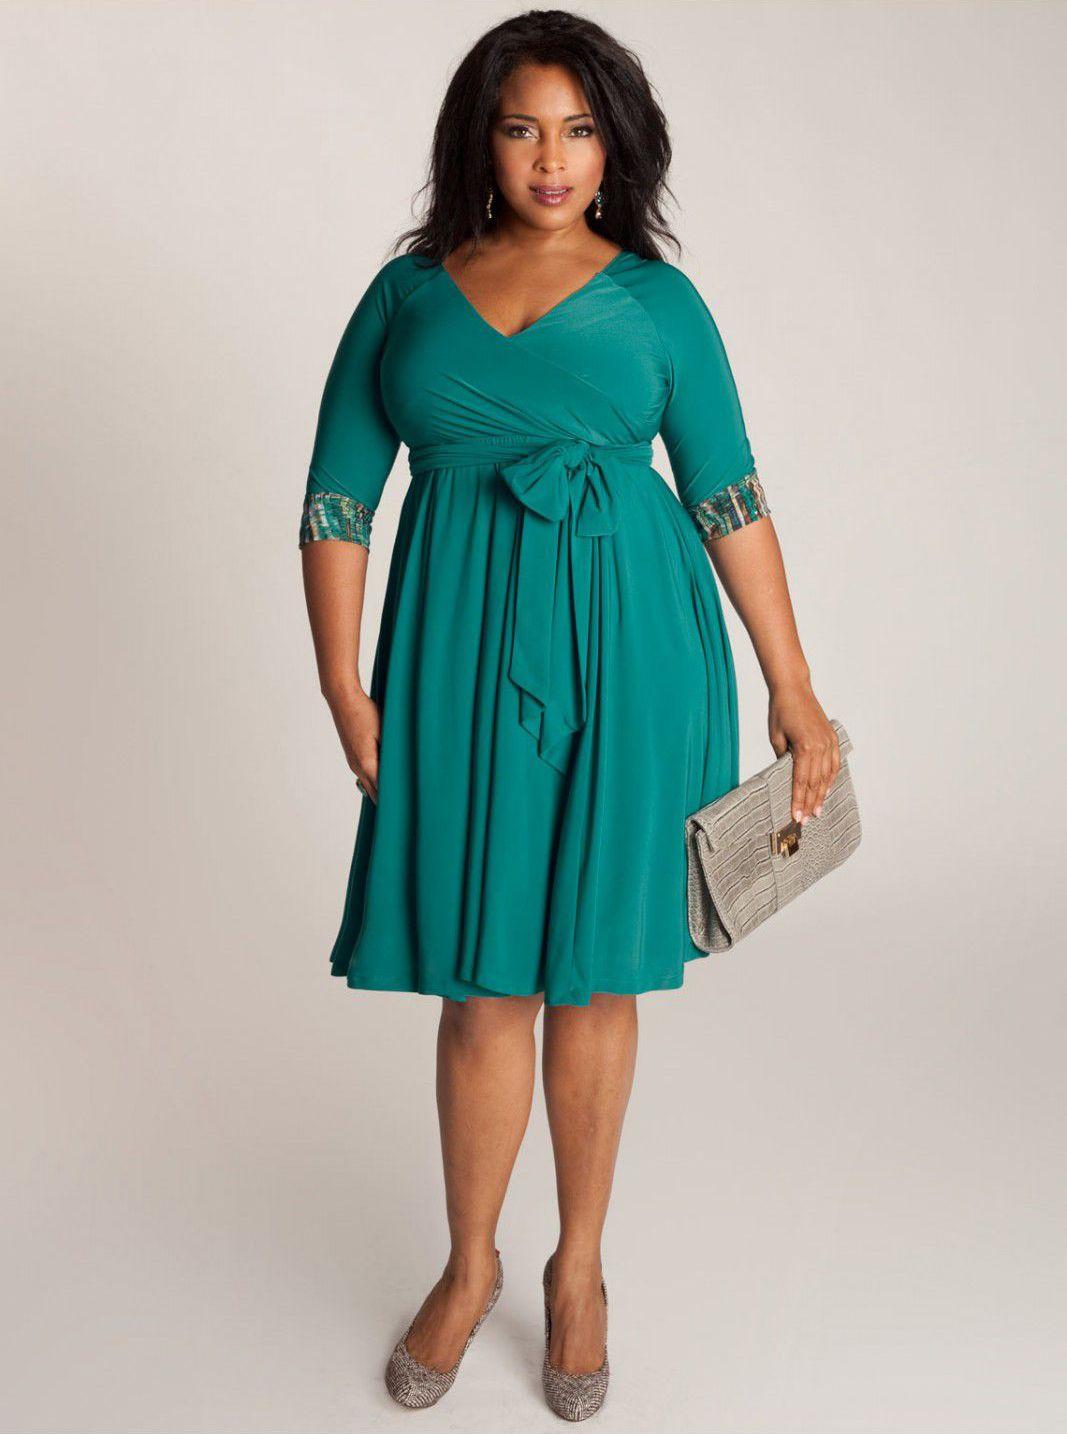 My favorite wrap dress! The Jaqueline 2-in-1 Dress in Jade by IGIGI ...